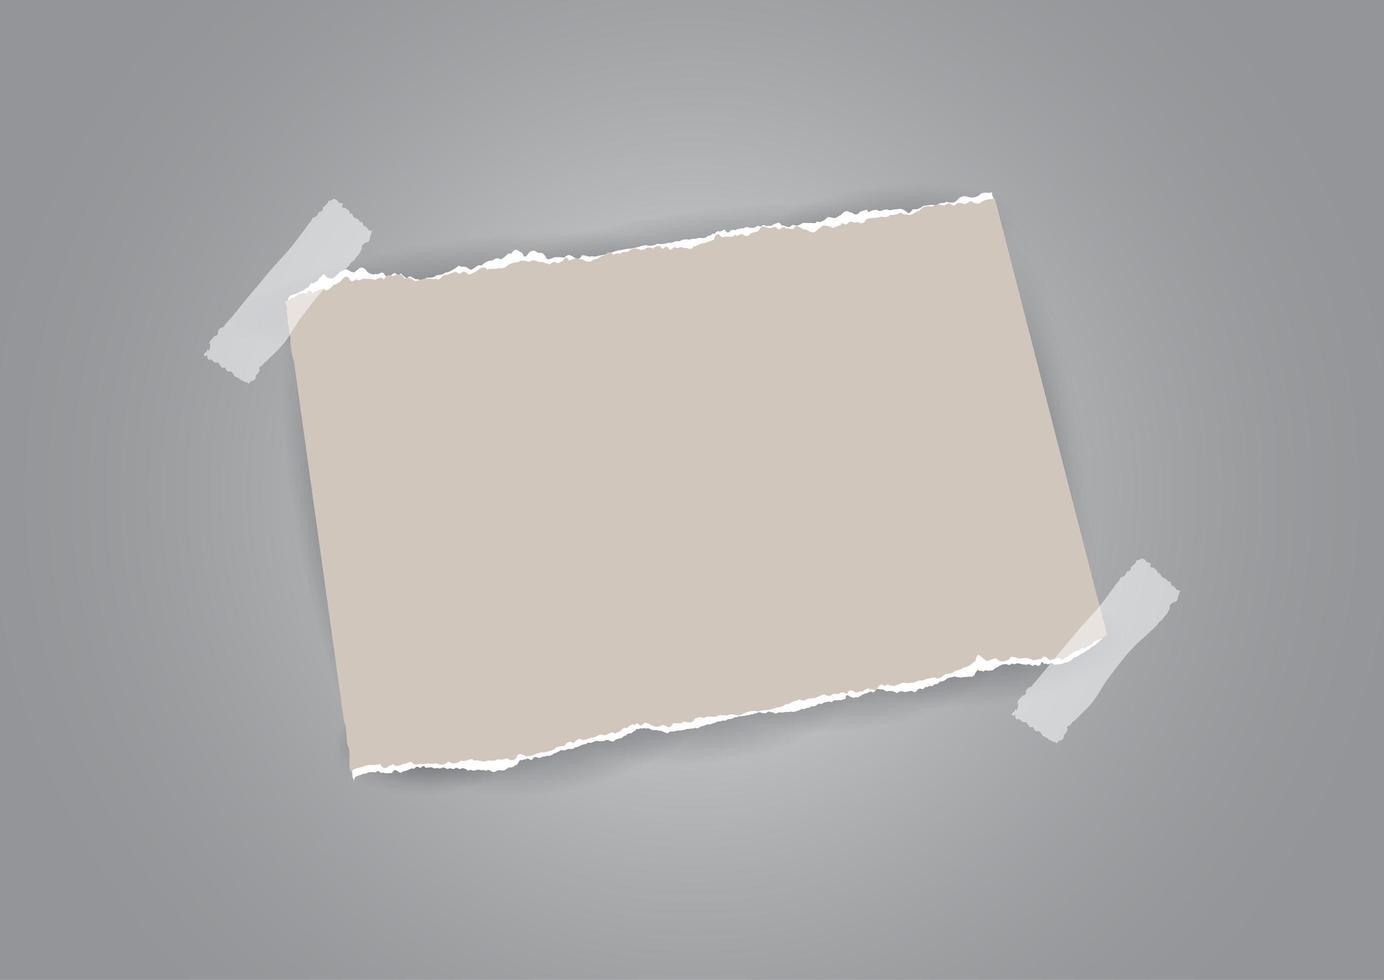 papel rasgado e fita adesiva vetor